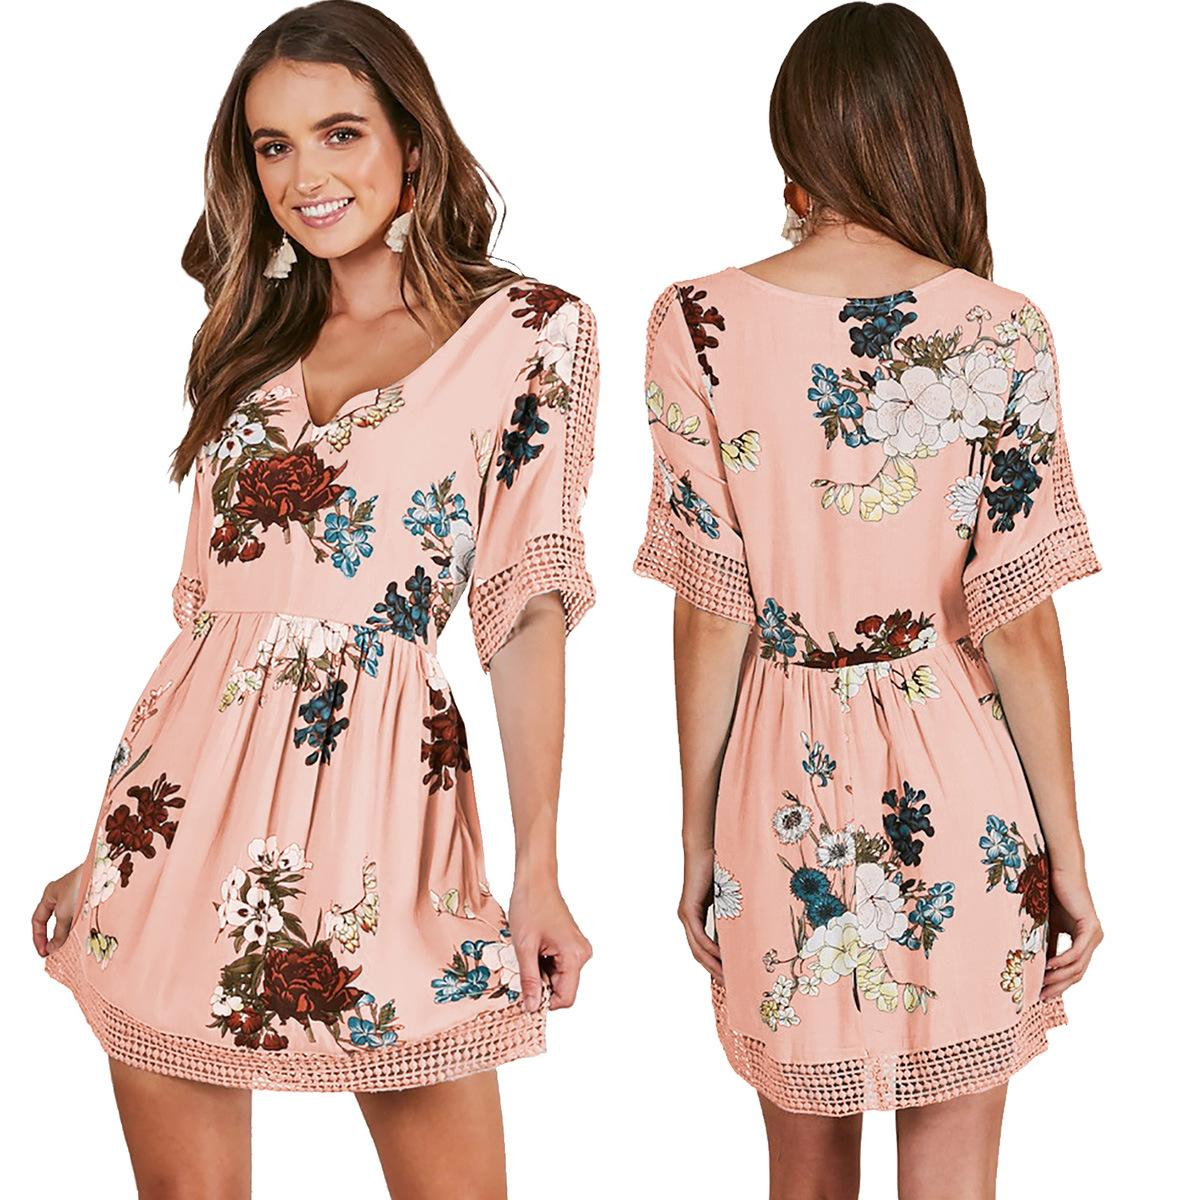 21eeb4a6f09b Summer Fashion Women Floral Print Dress Sexy Deep V Neck Short Sleeve  Hollow Out Pink Dresses Bohemia Vintage Beach Mini Vestidos Tunic Dress  White Dresses ...